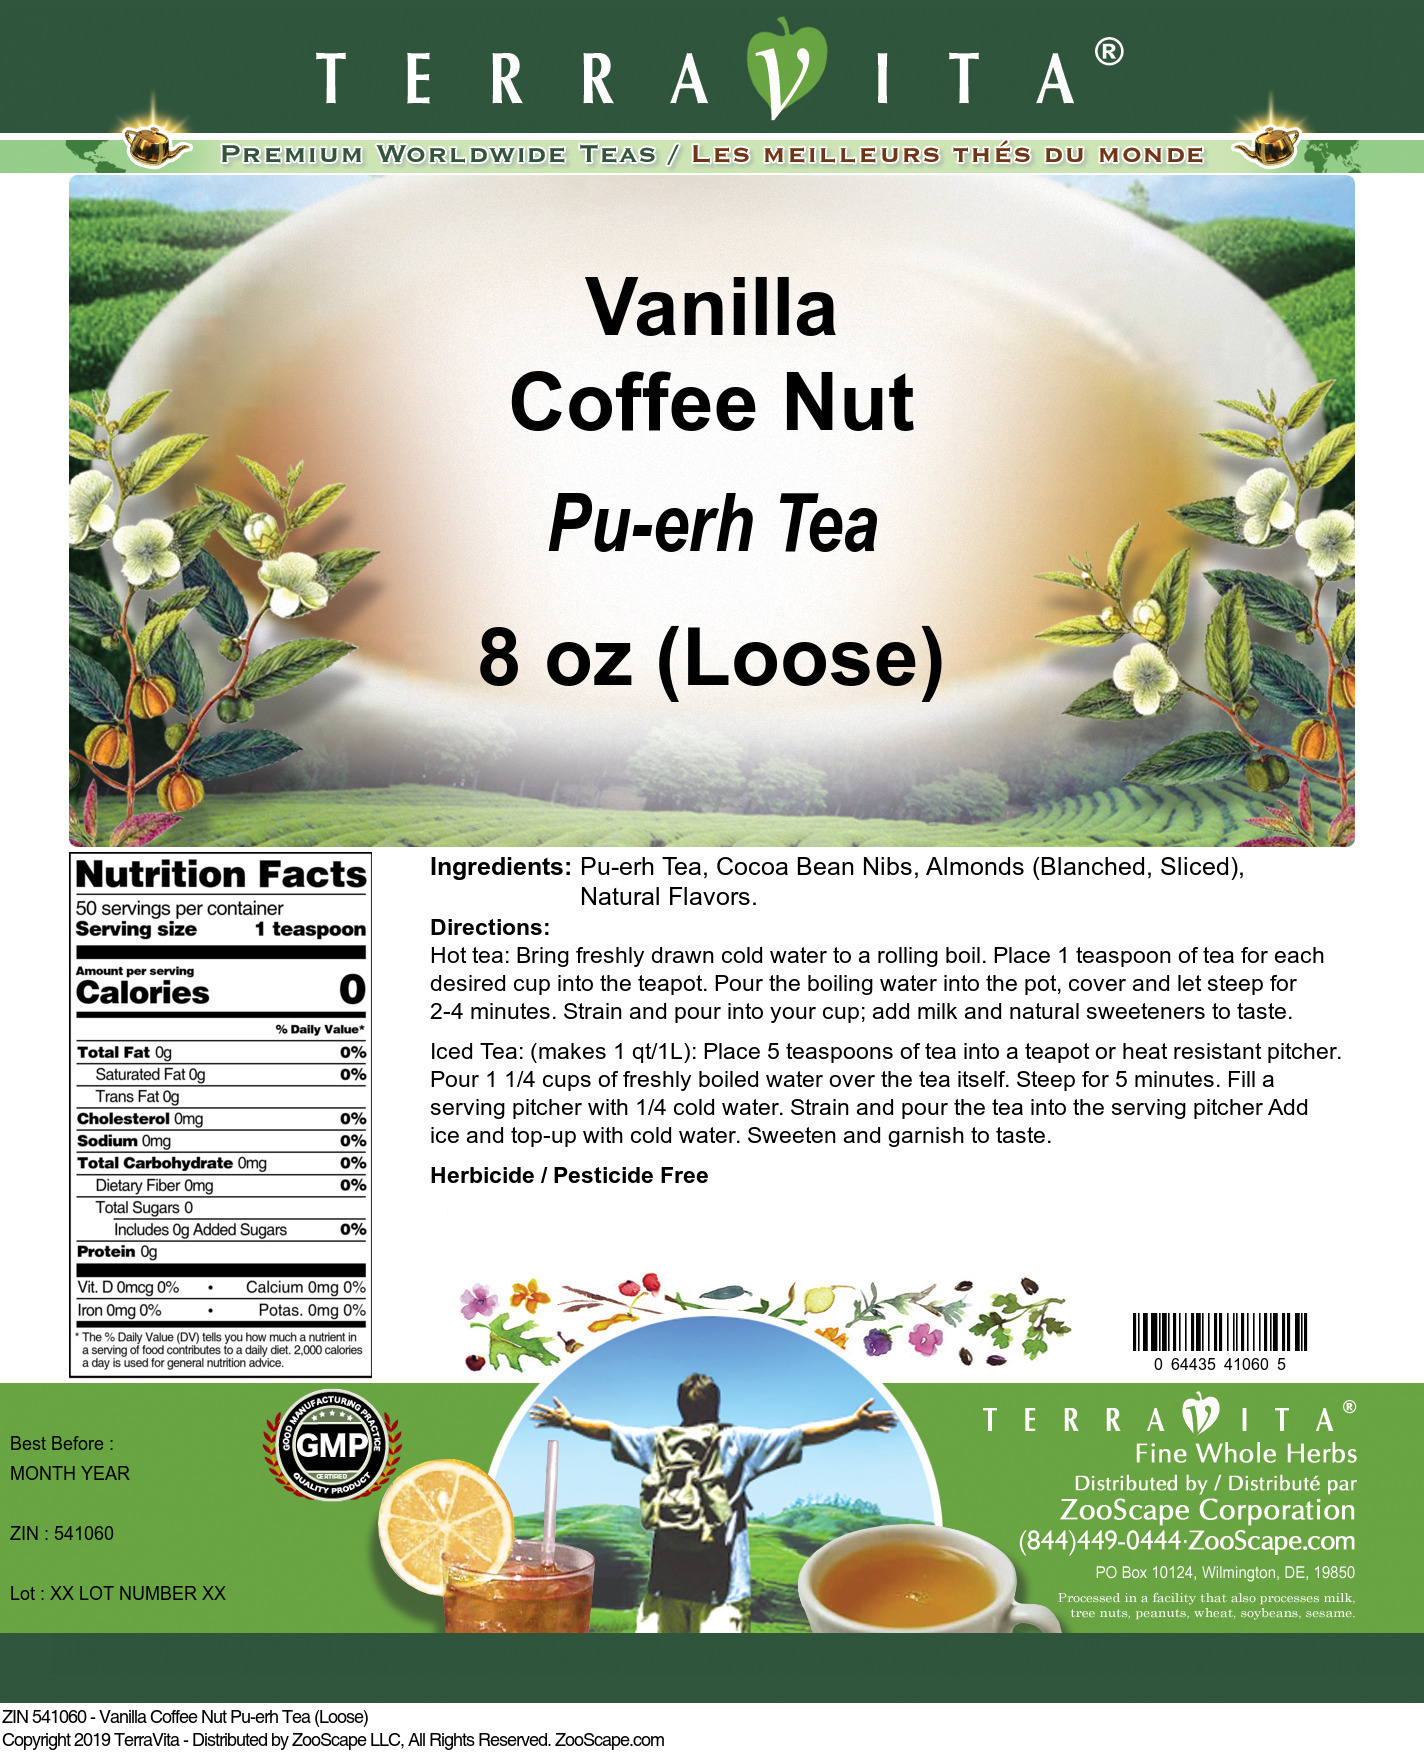 Vanilla Coffee Nut Pu-erh Tea (Loose)